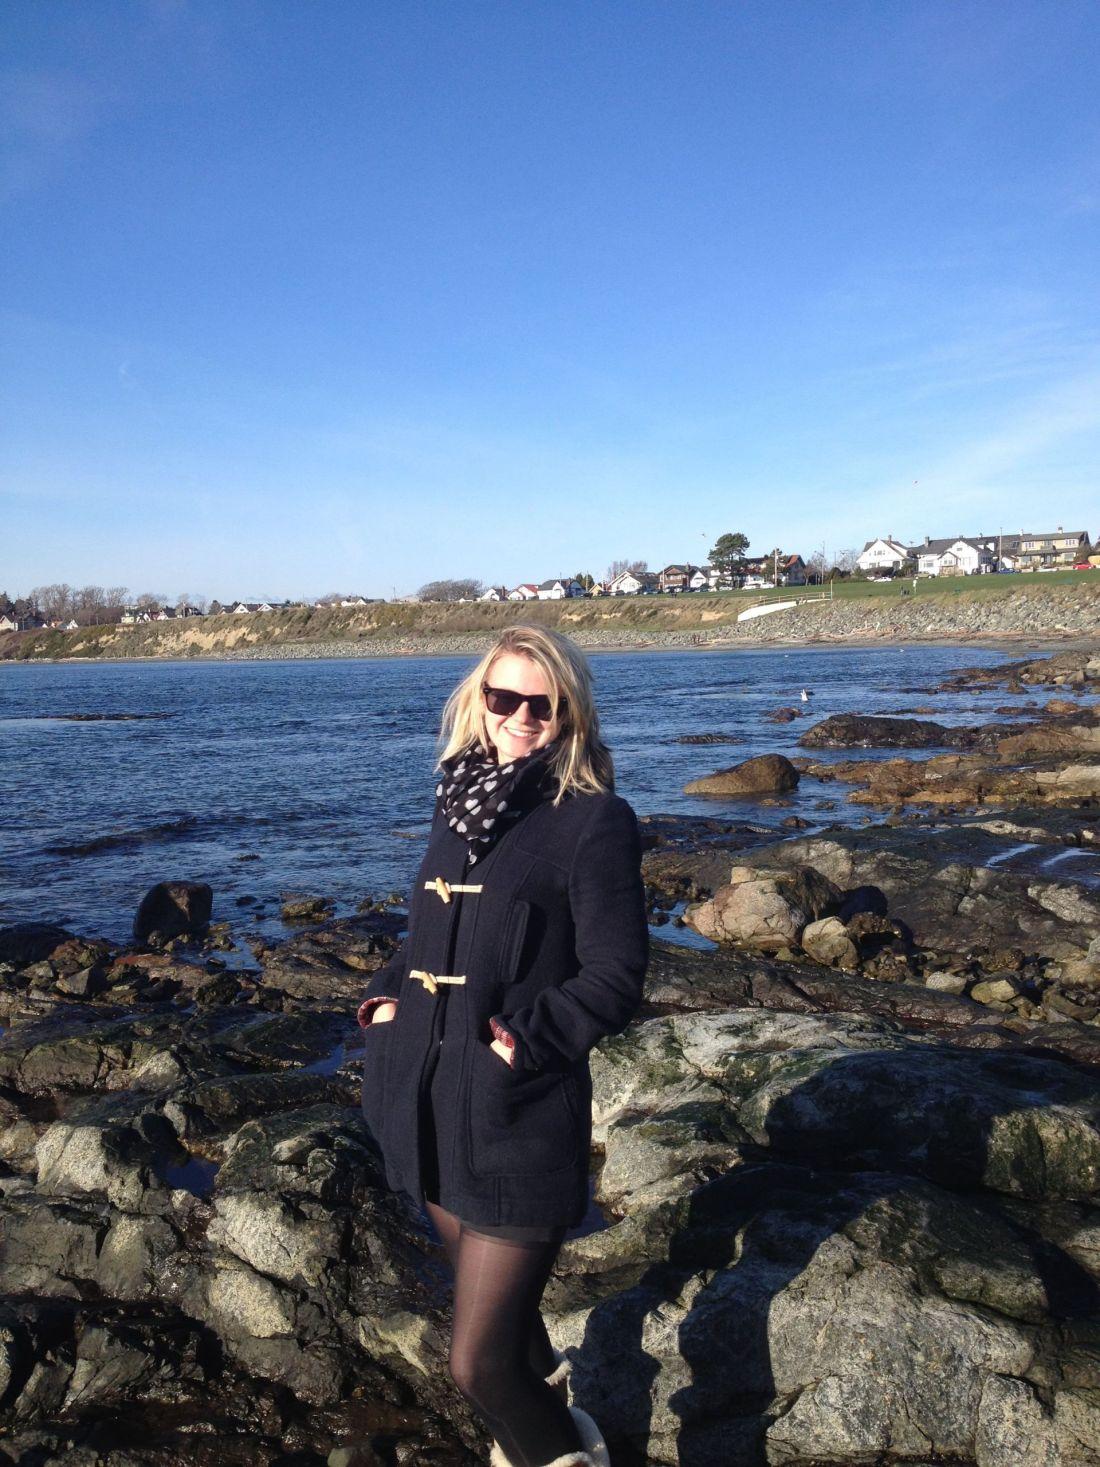 Laura on Steve Fonyo Beach, Victoria